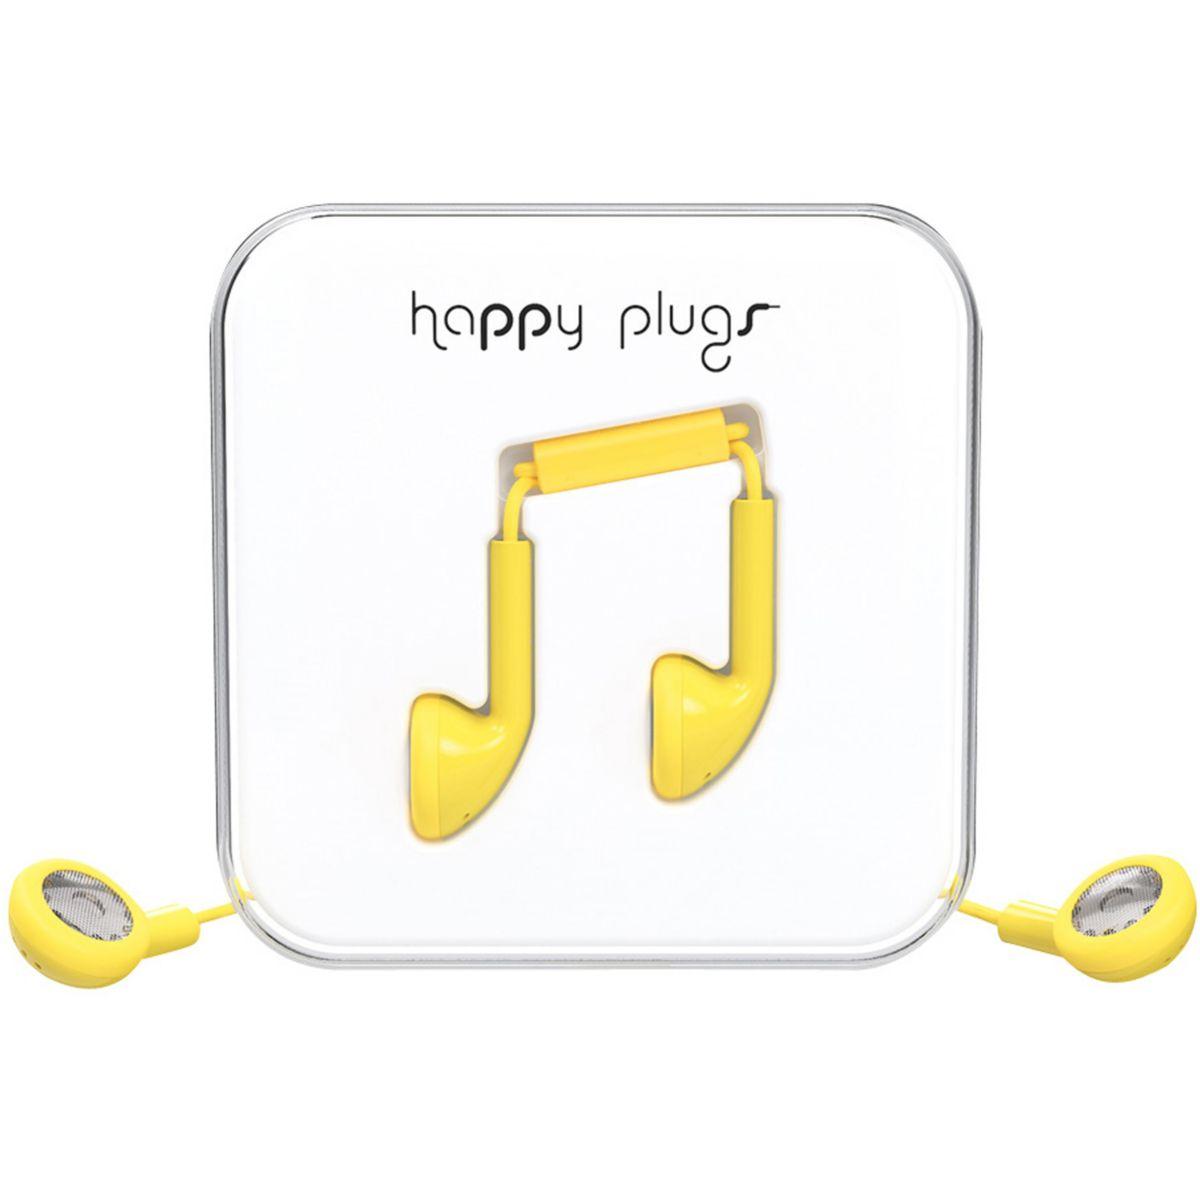 Ecouteurs avec micro happy plugs earbud yellow - 20% de remise...